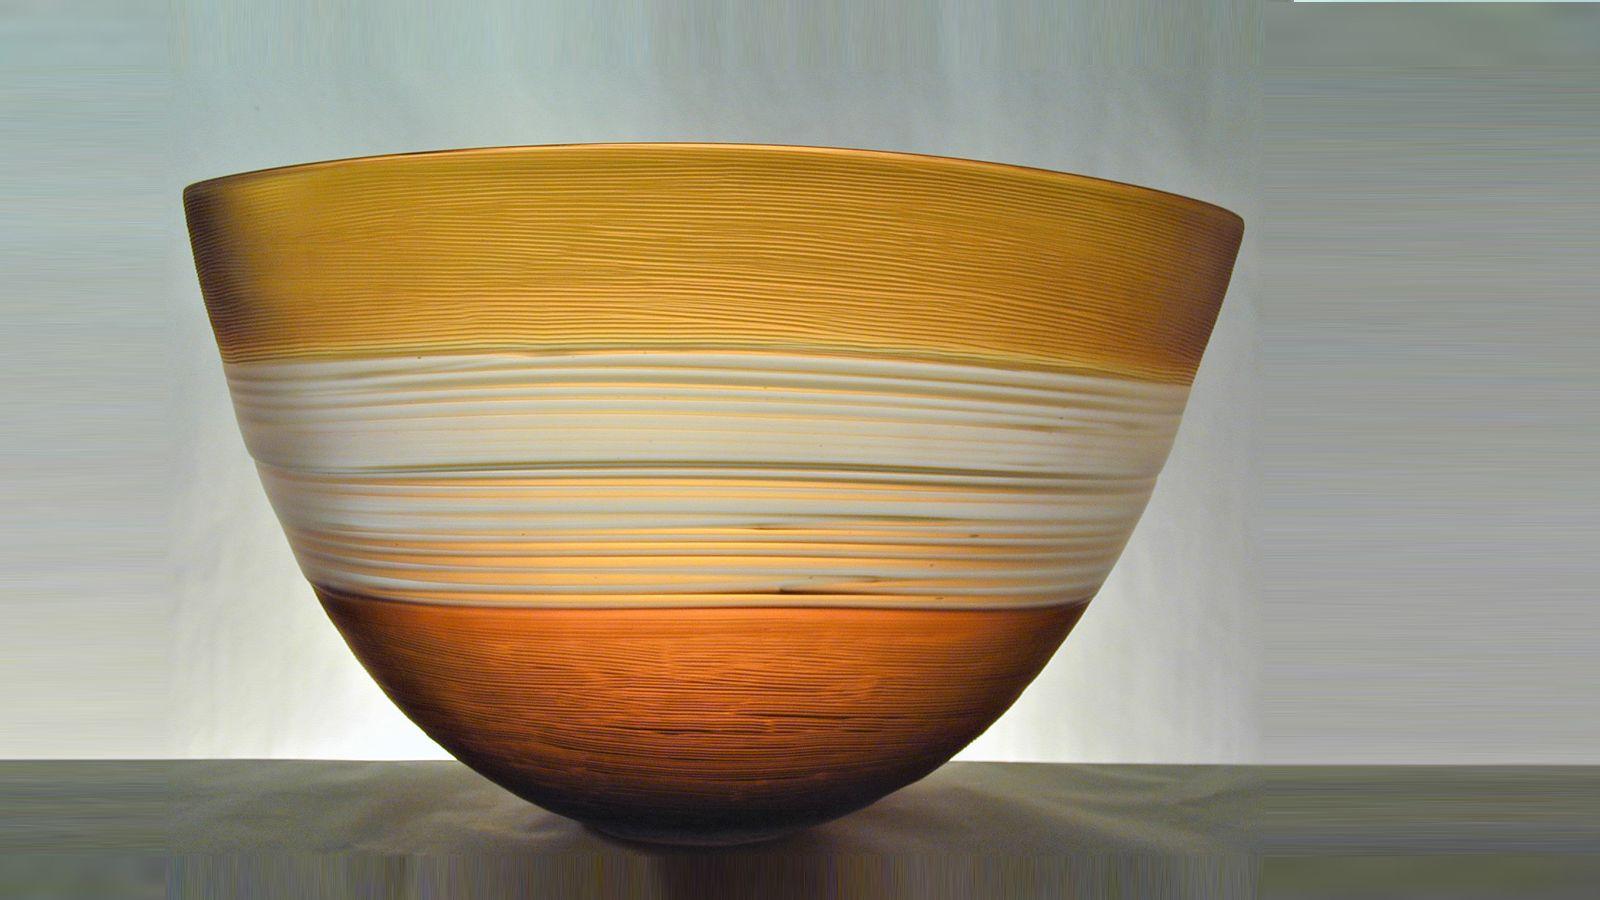 Stewart Hearn Hand Blown Glass Strata Bowl, Gold with Clear Trails